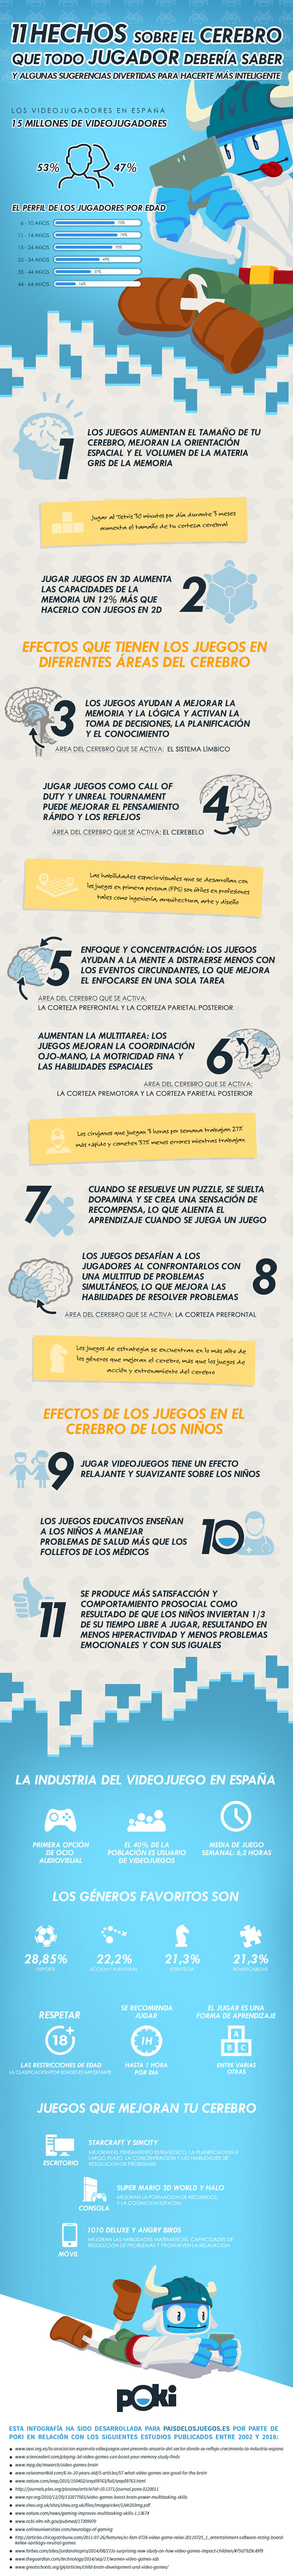 beneficios videojuegos infographic_espanol